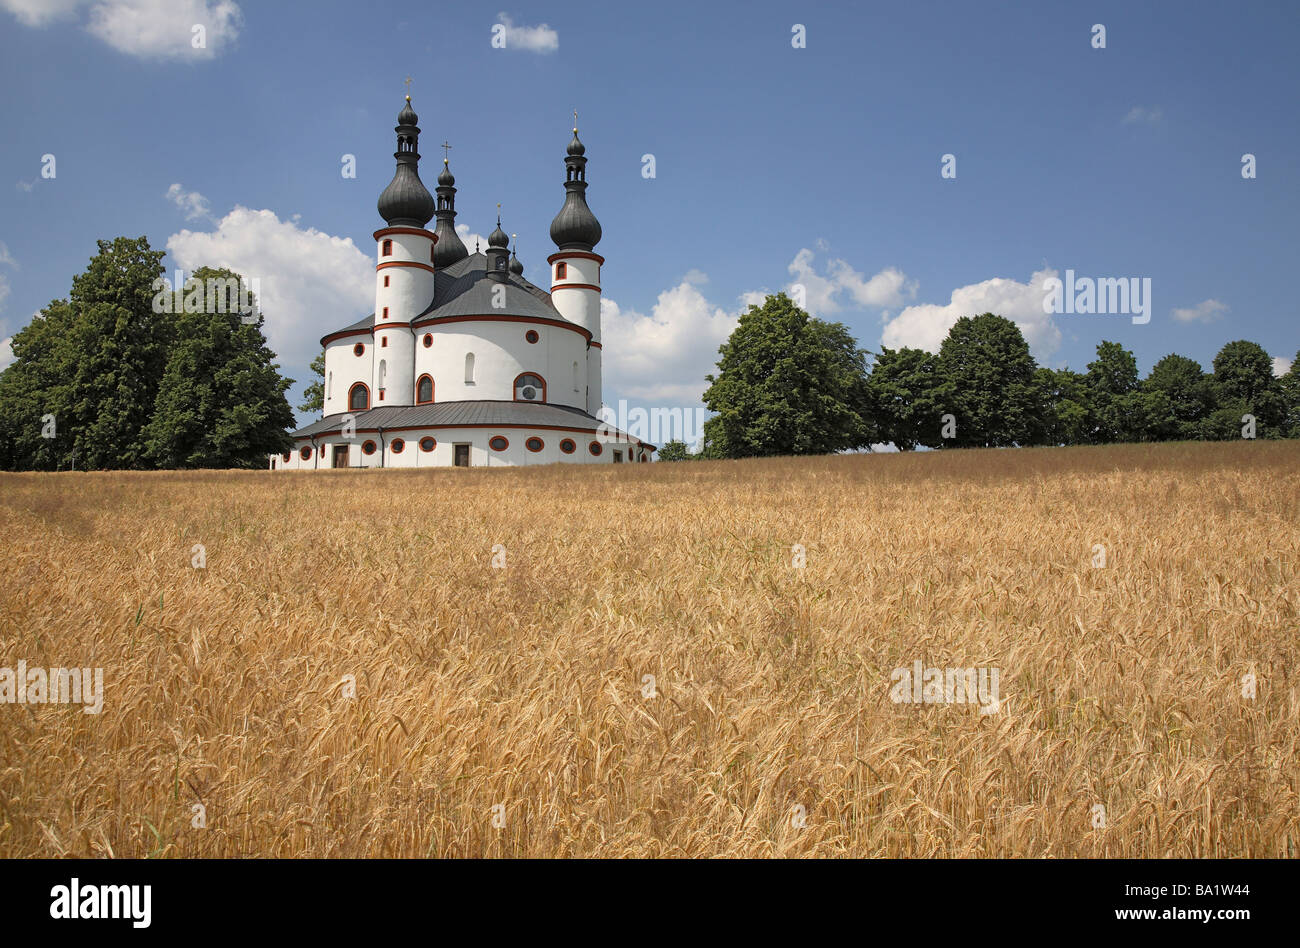 The pilgrimchurch of Kappl near Waldsassen Upper Palatinate Bavaria Germany - Stock Image